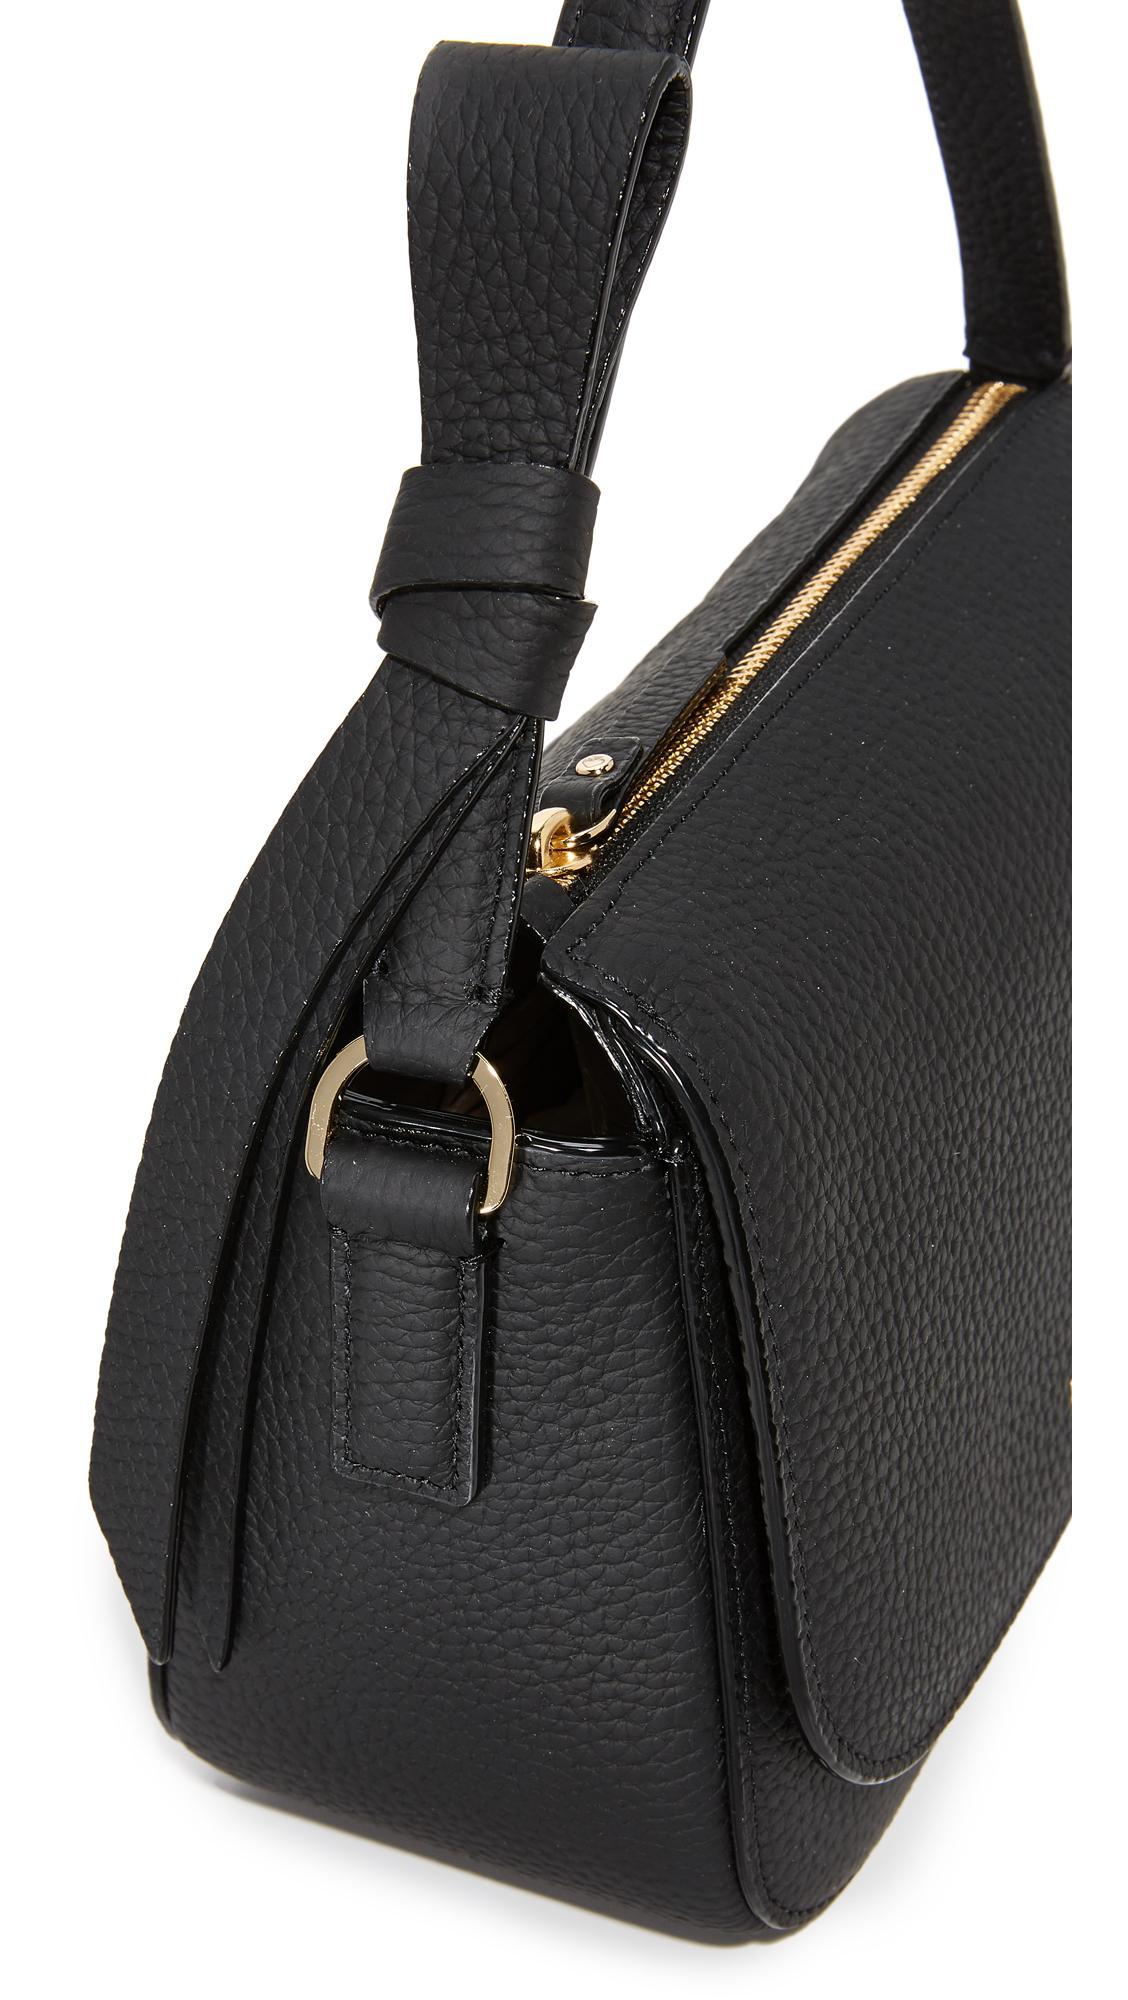 Kate Spade Leather Alfie Crossbody Bag in Black